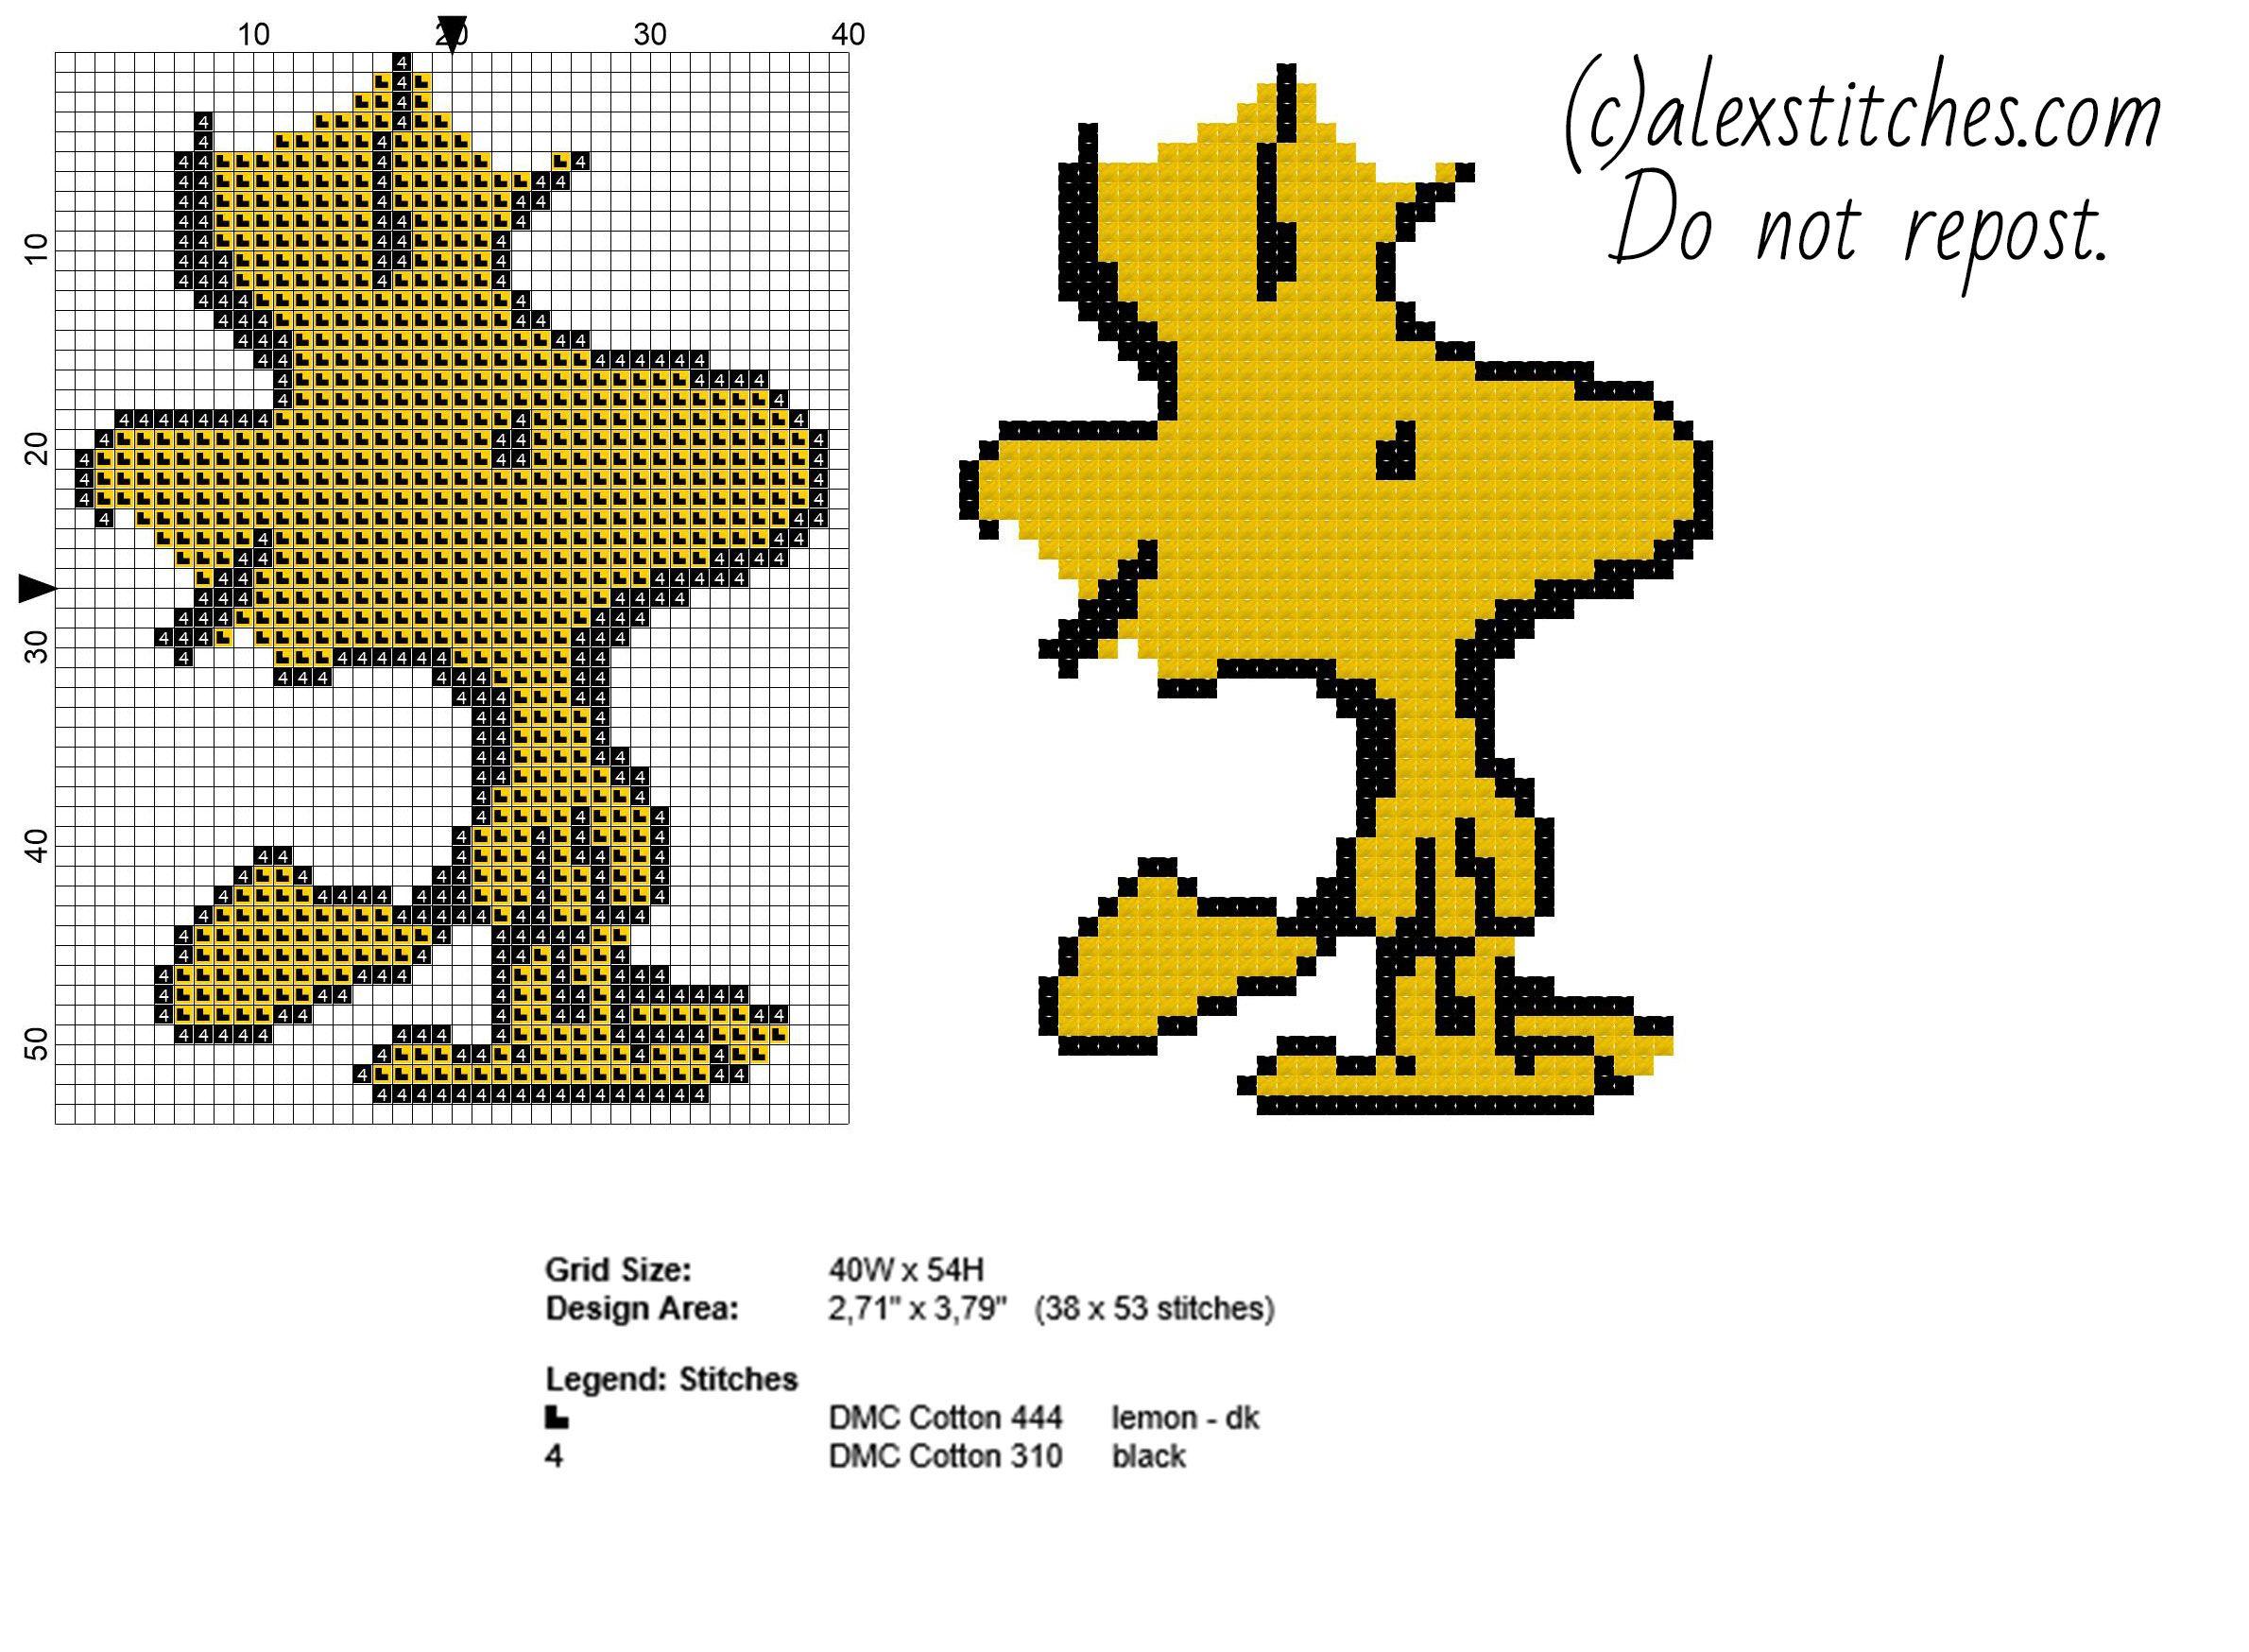 Woodstock Peanuts character free cross stitch pattern - free cross stitch patterns by Alex